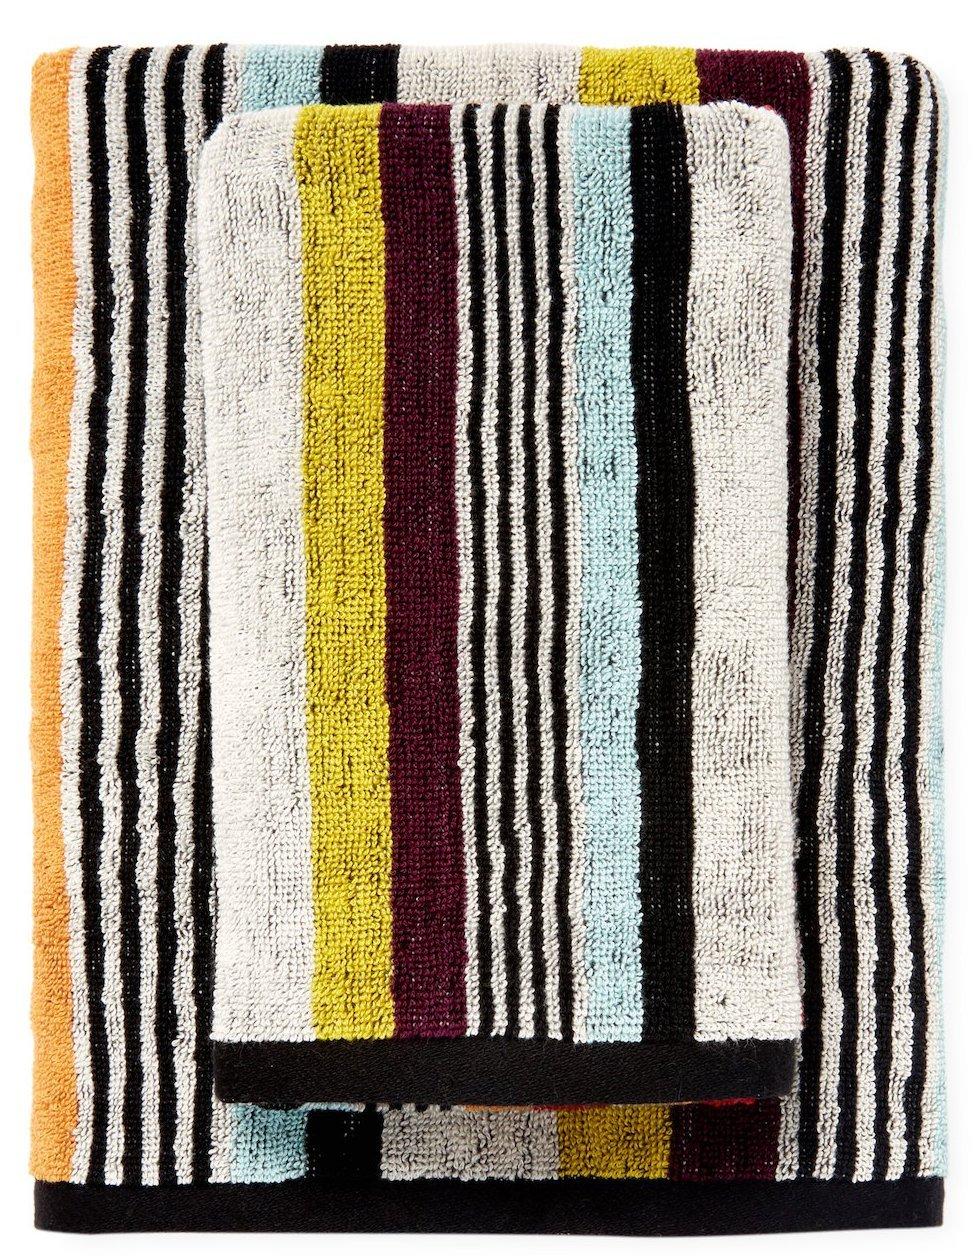 Cheap Missoni Towels On Sale Find Missoni Towels On Sale Deals On